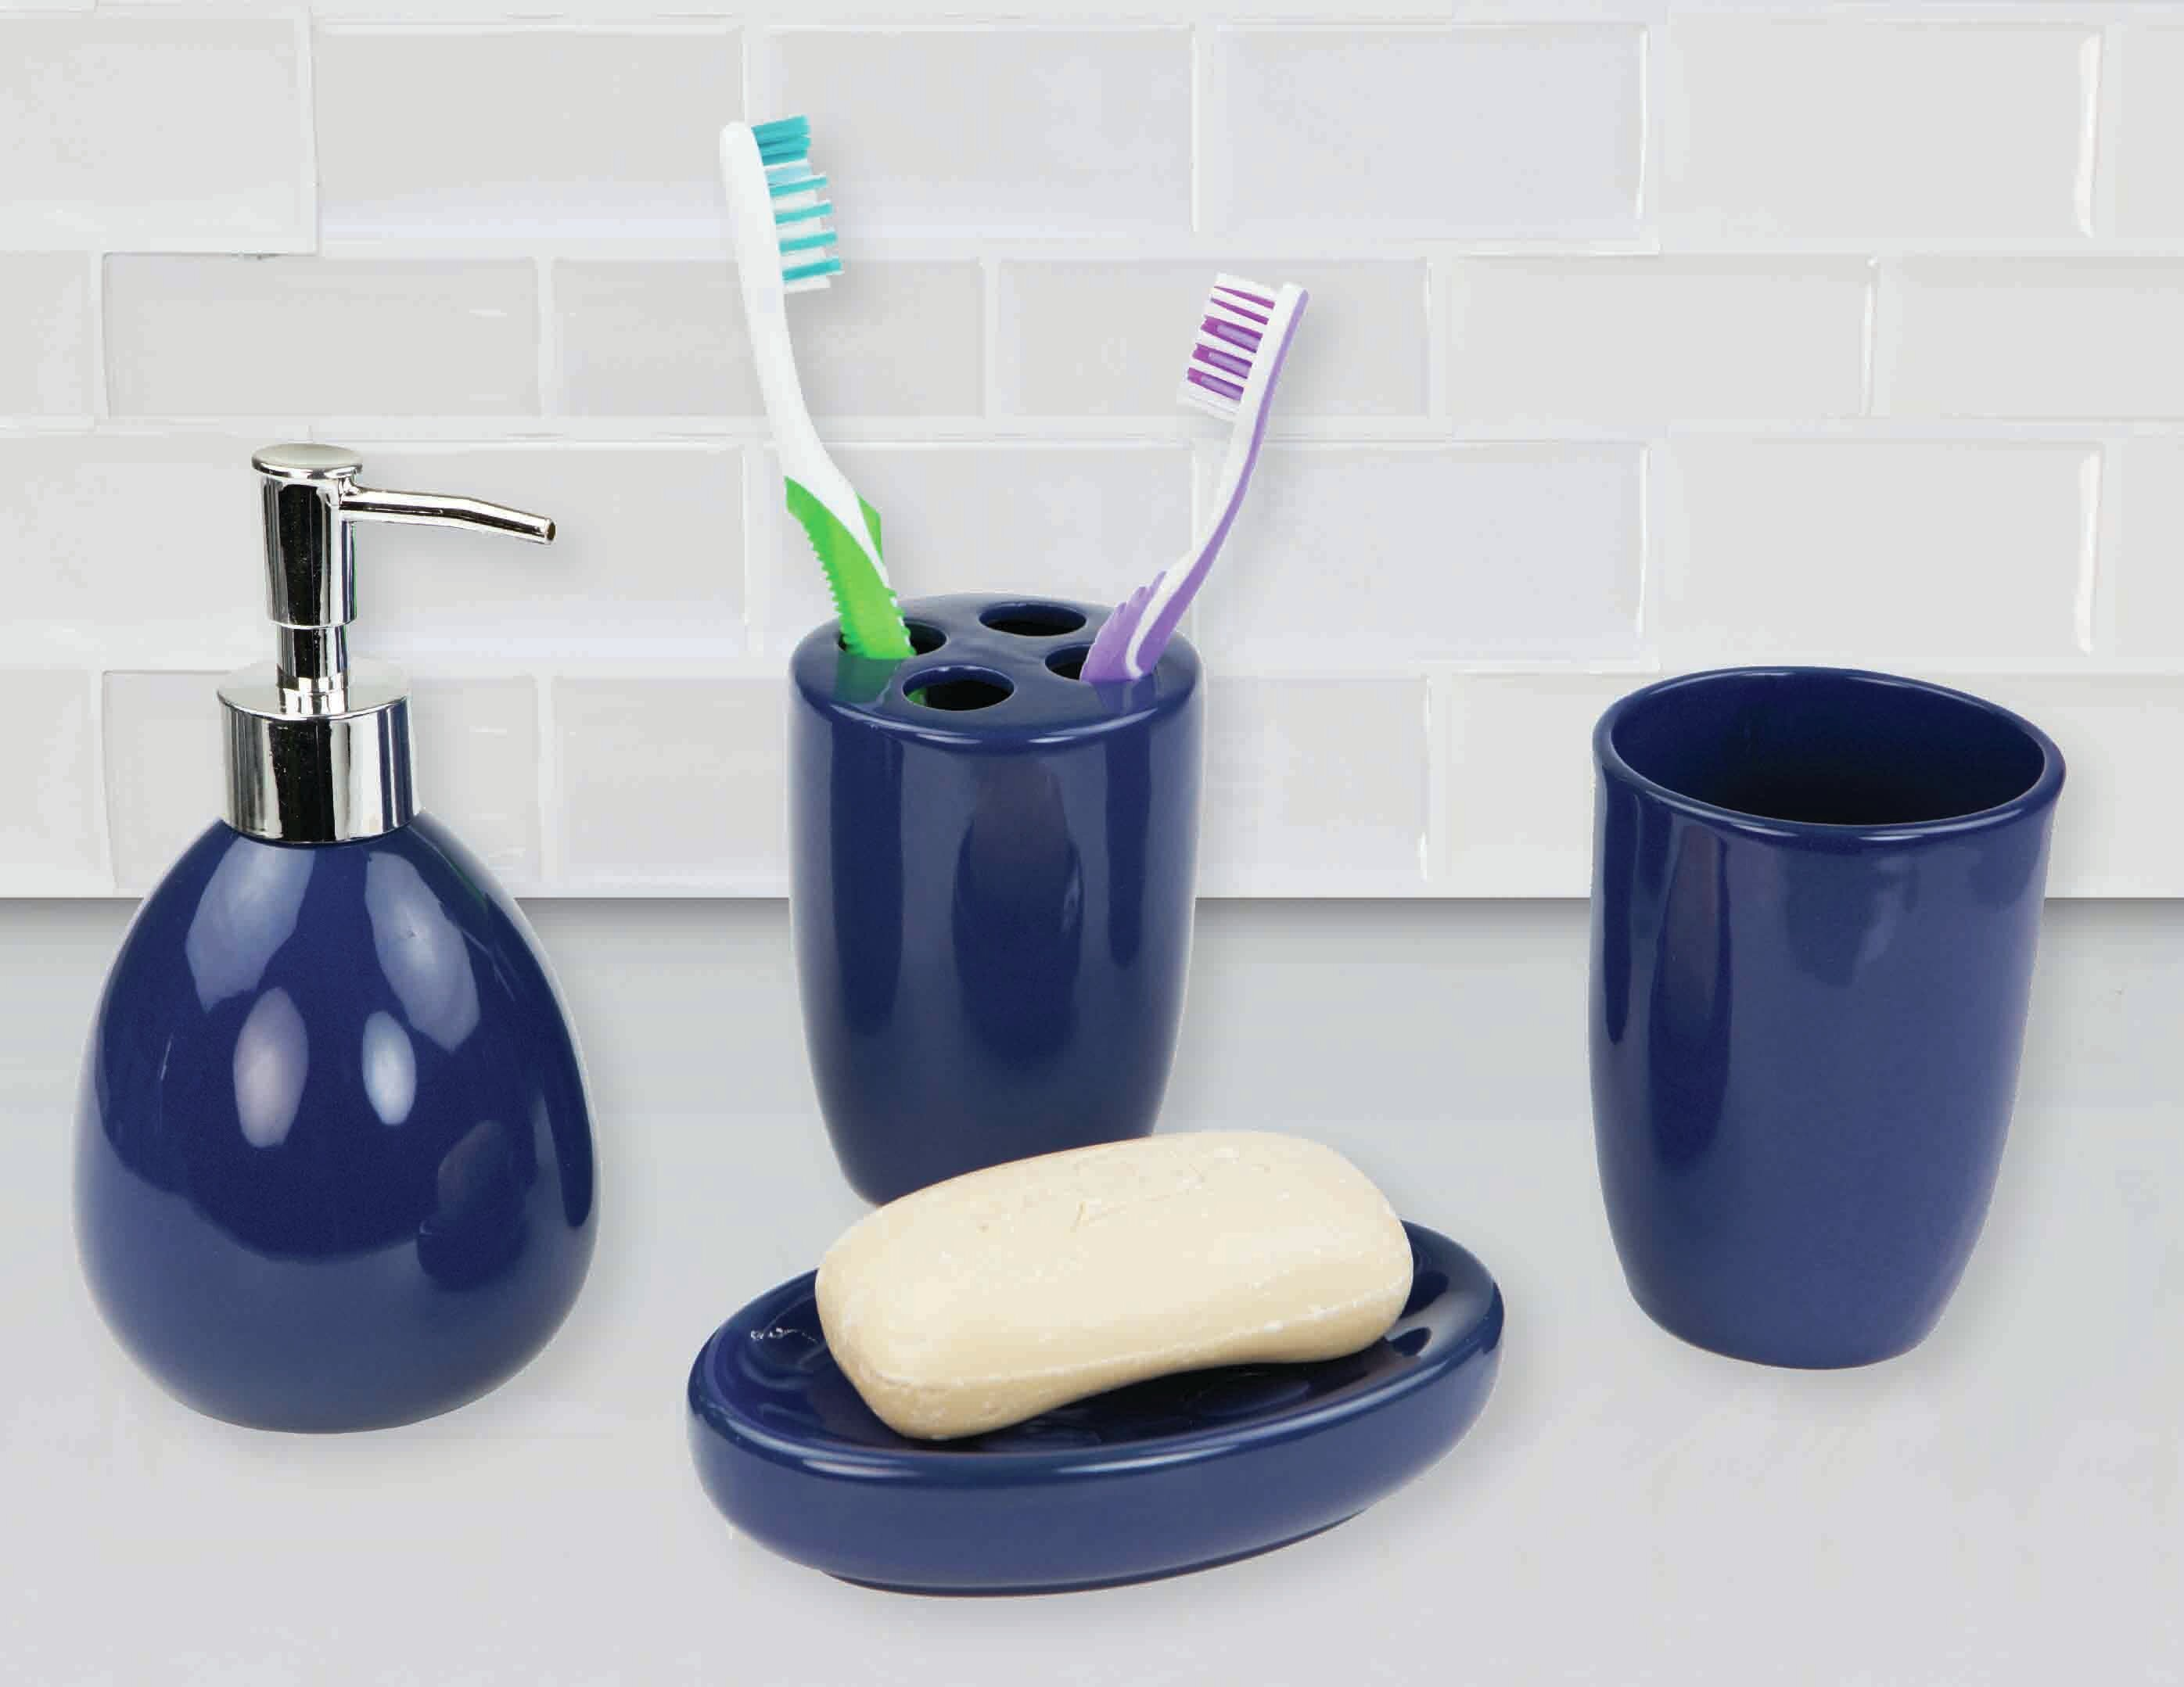 Zig Zag Black White Soap Dish Holder Ceramic Bath Tray Modern Bathroom Accessory